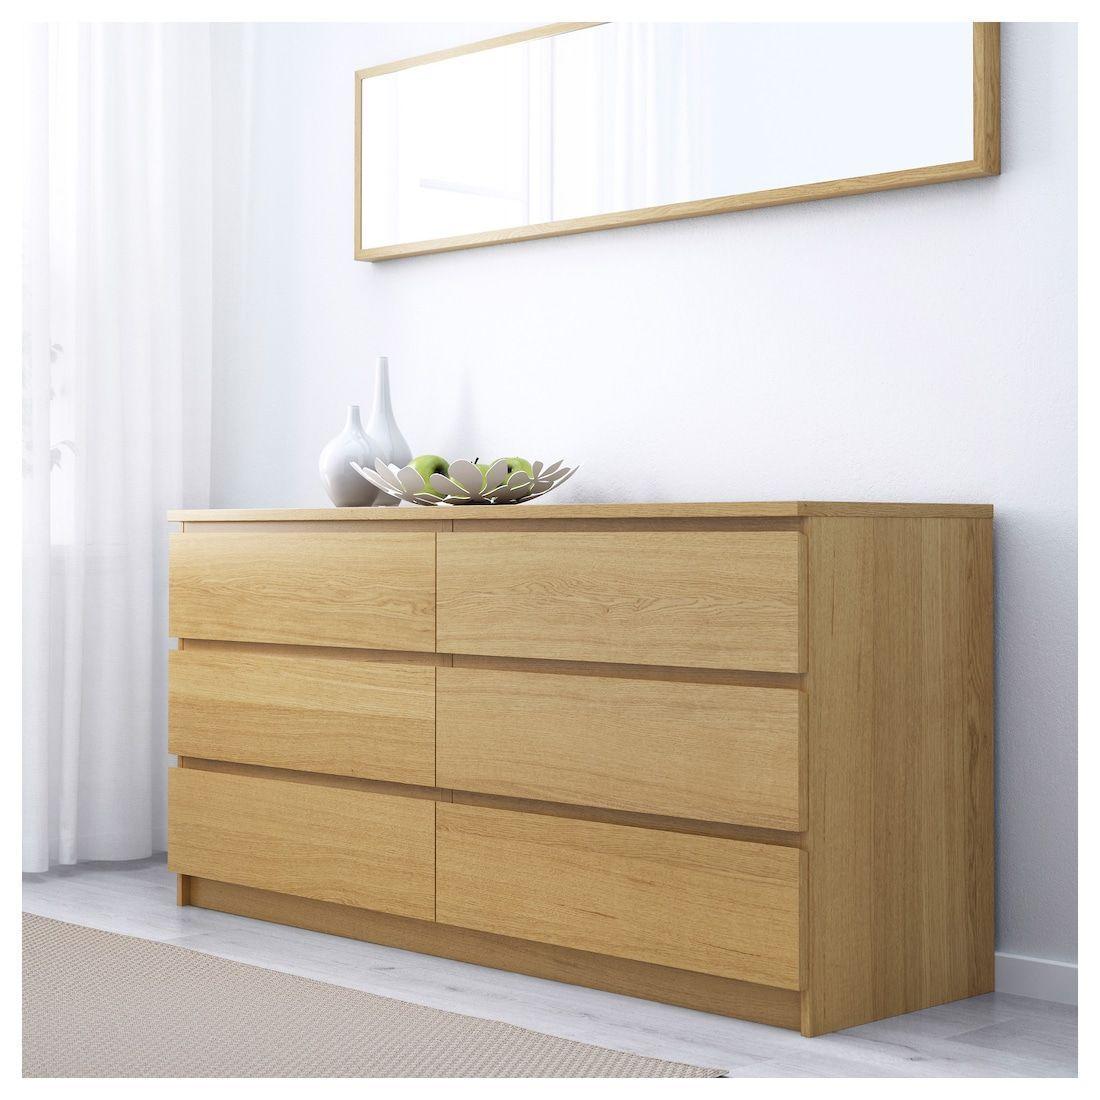 Eiche Ikea Malm Kommode 3 Schubladen